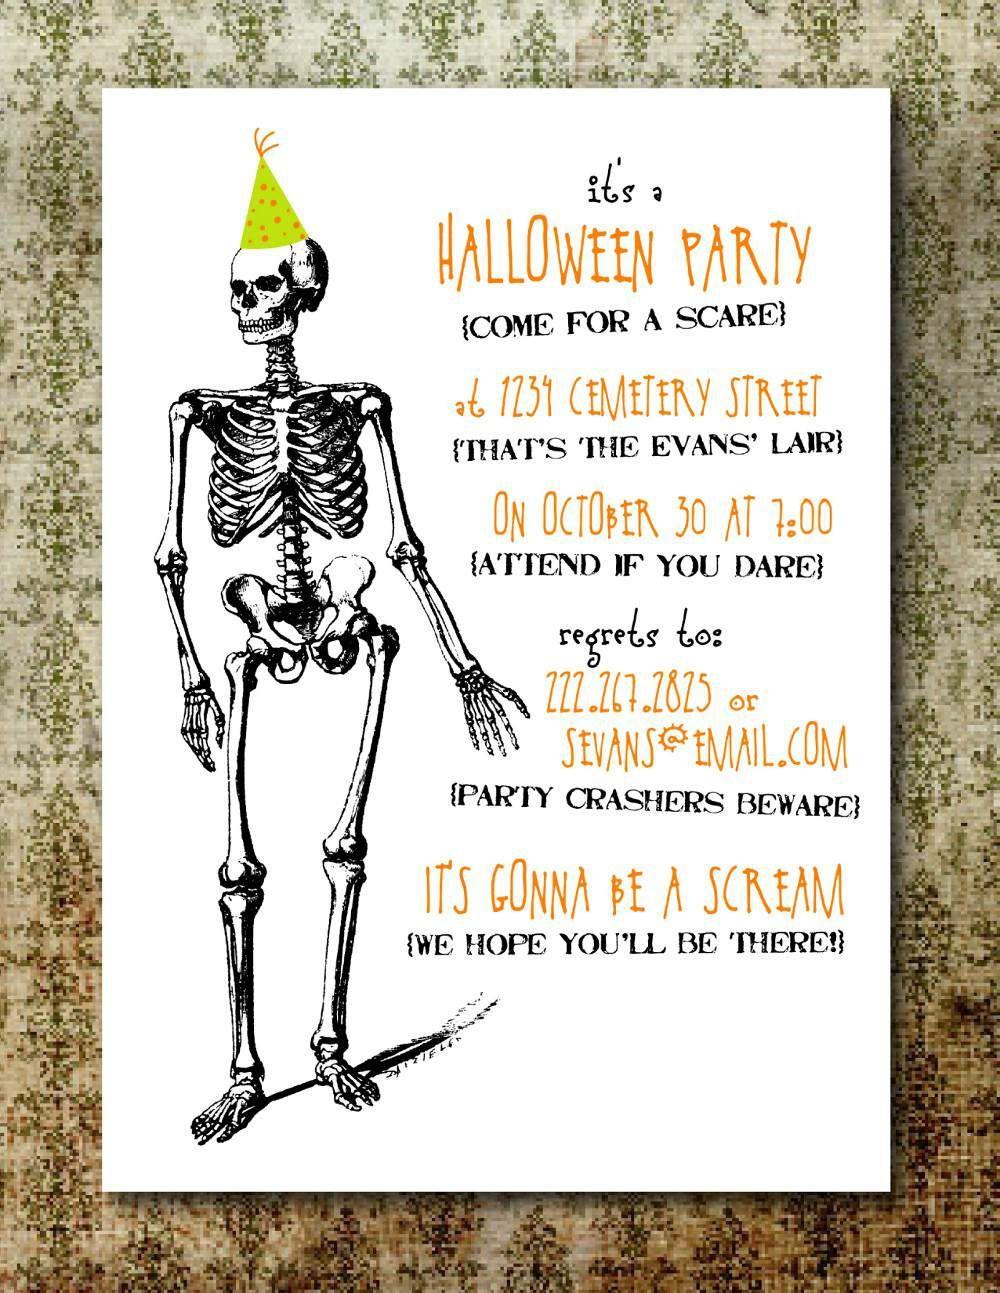 Free Printable Halloween Invitation Templates | Free Printable - Free Printable Halloween Party Invitations